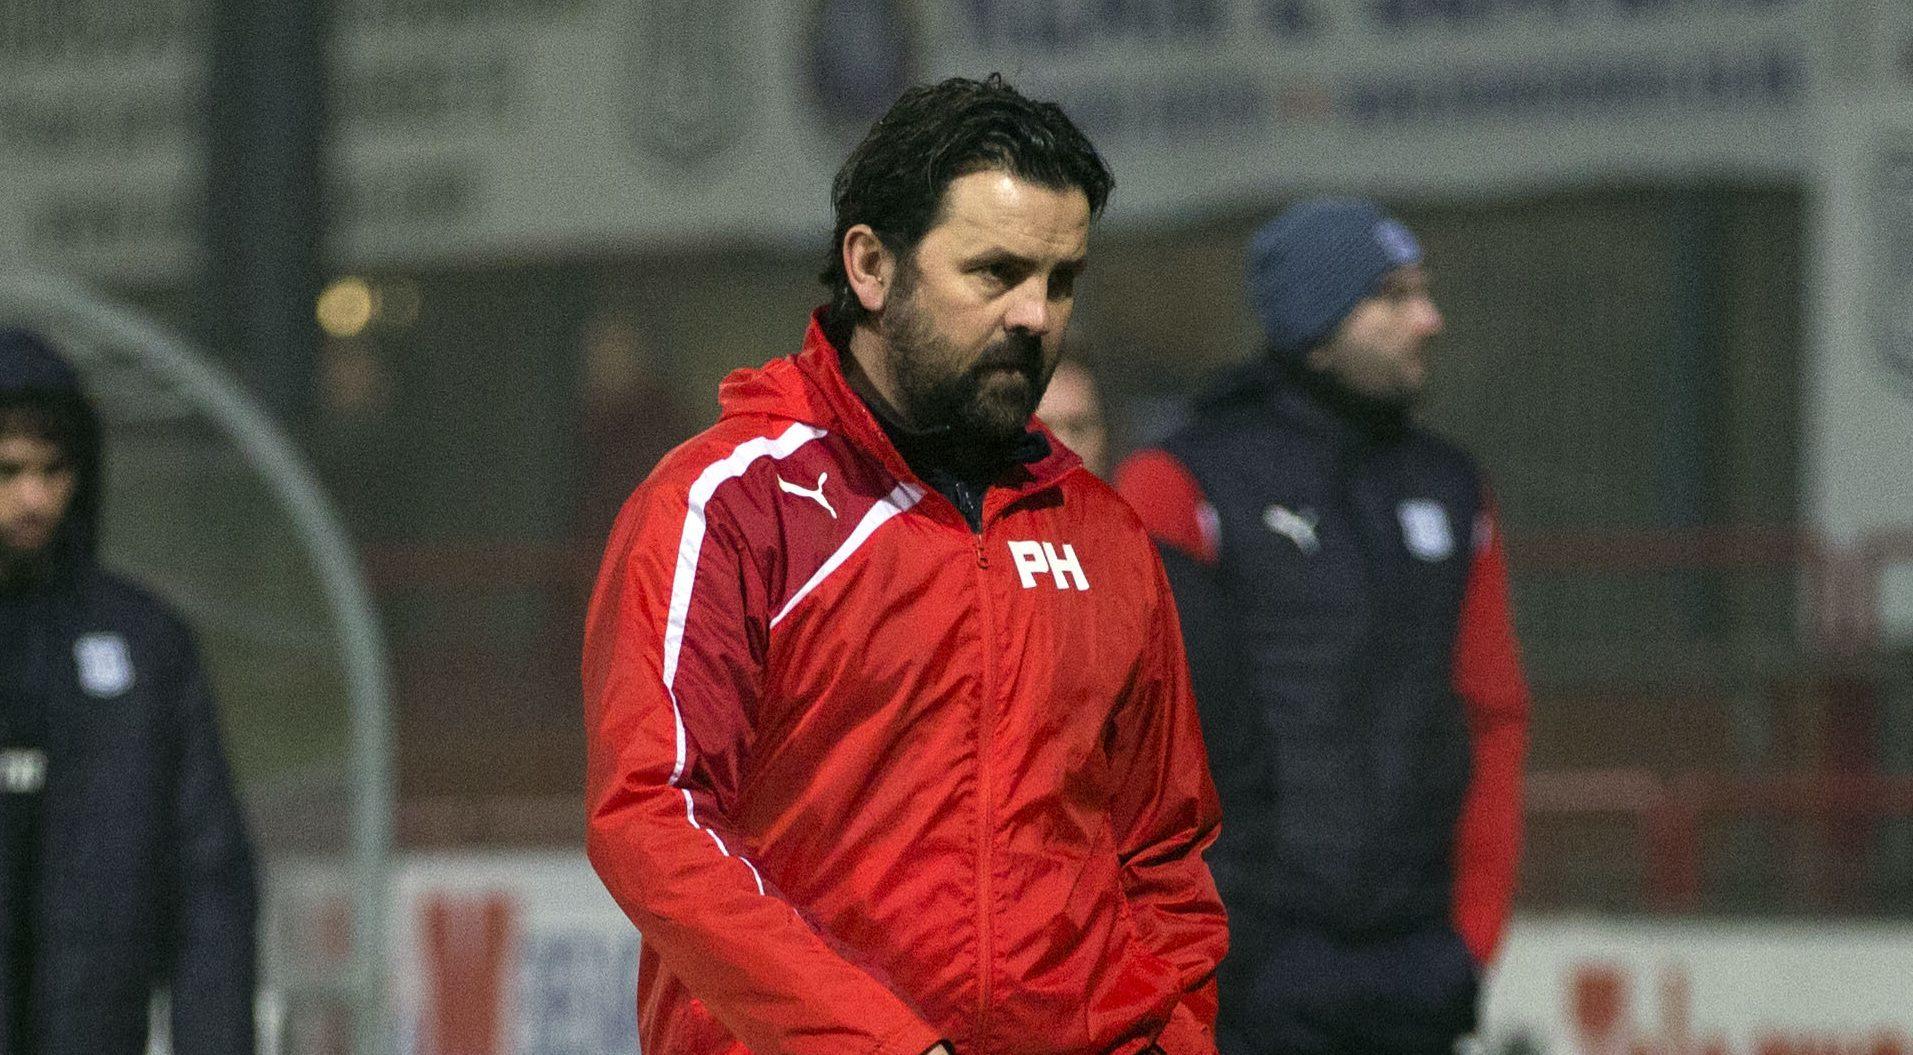 Paul Hartley after the St Mirren shock.